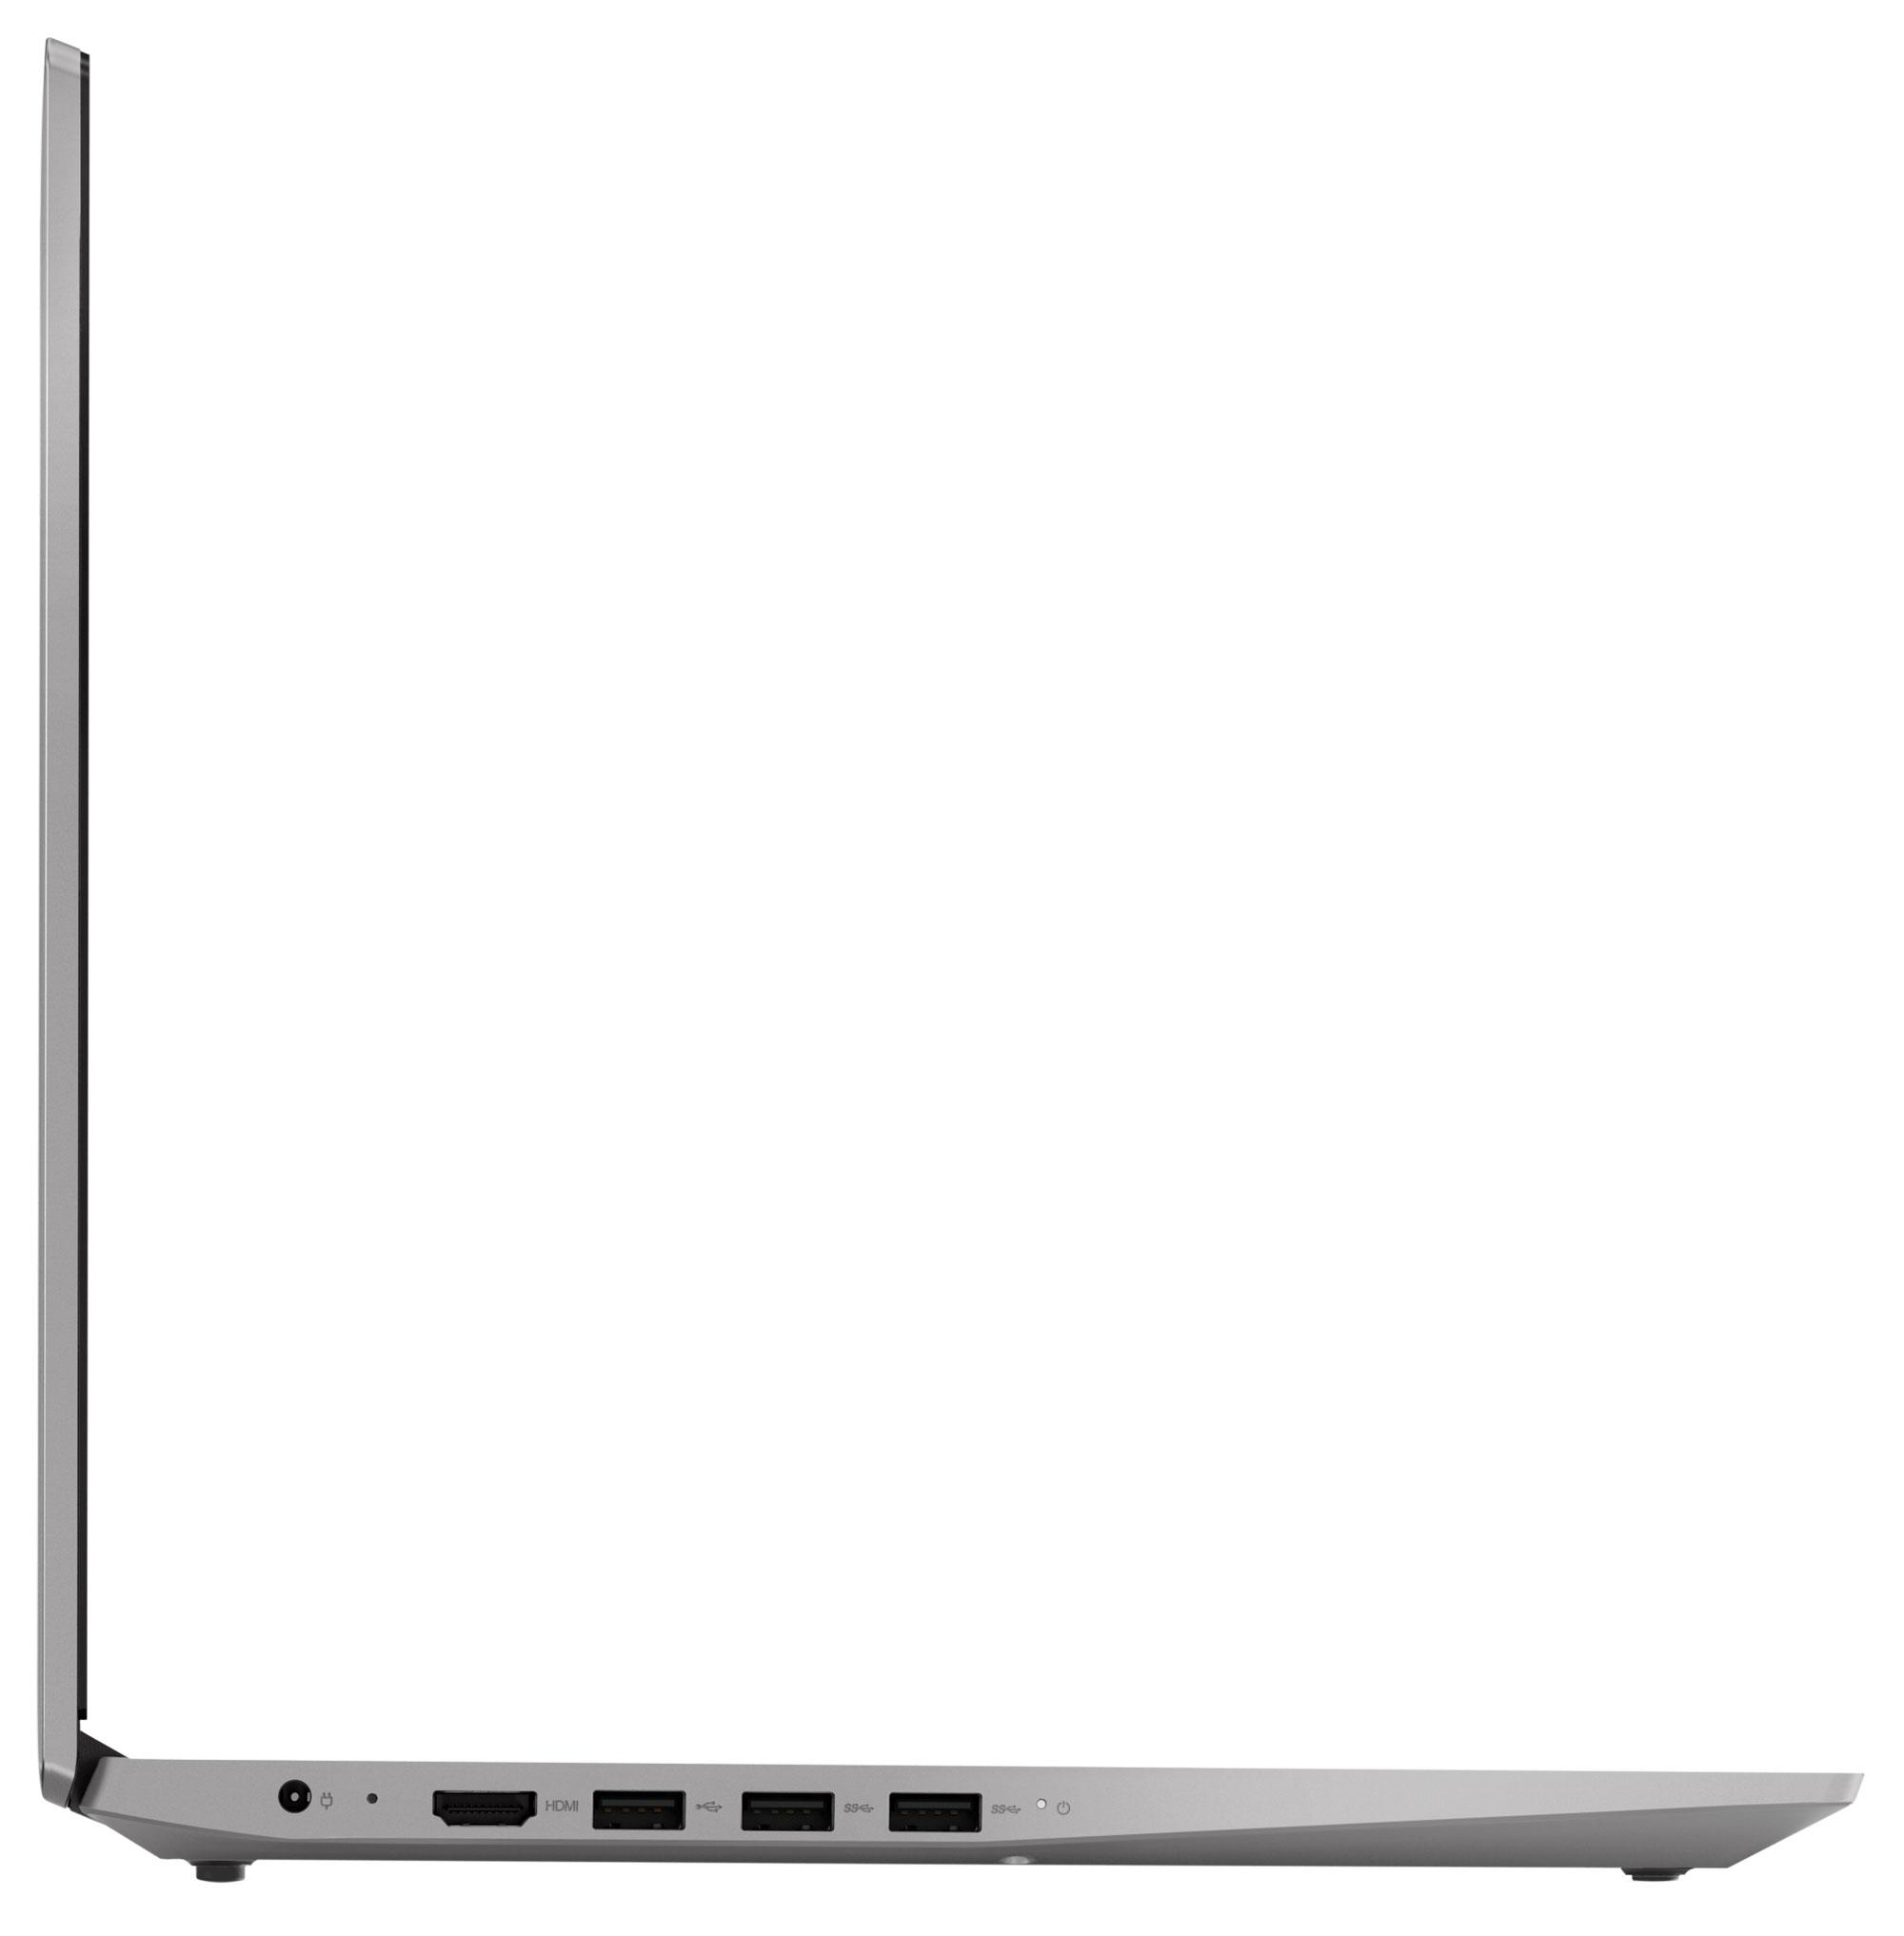 Фото  Ноутбук Lenovo ideapad S145-15IWL Grey (81MV00JCRE)